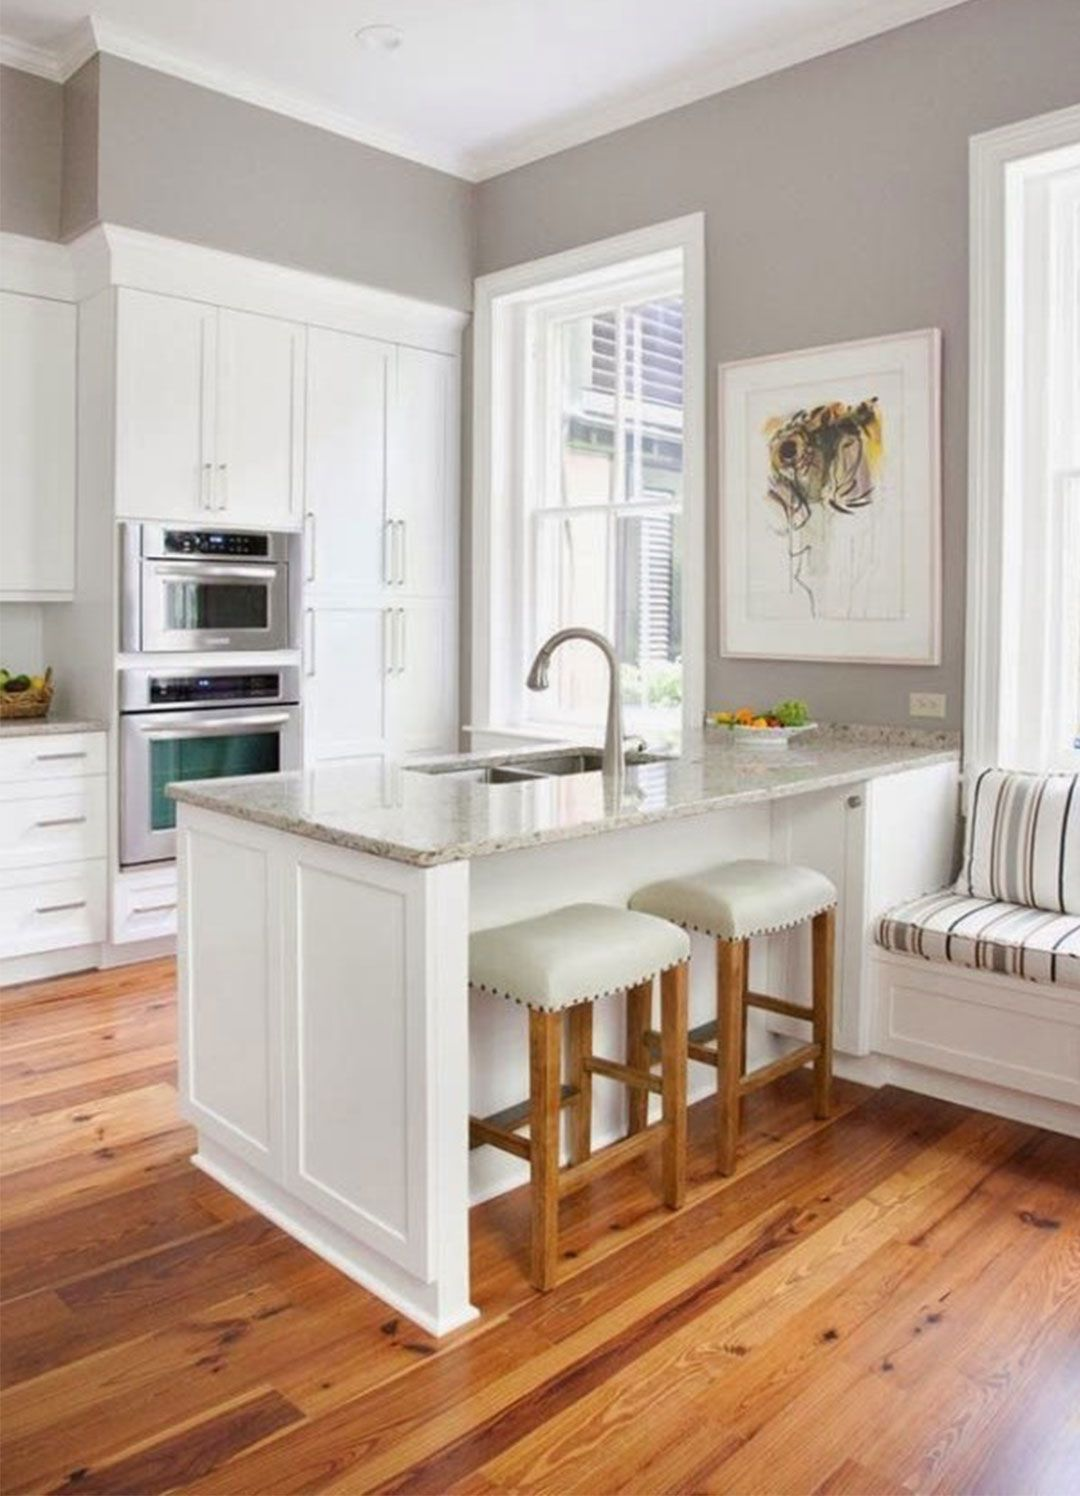 Tags kitchen ideas best small kitchen designs